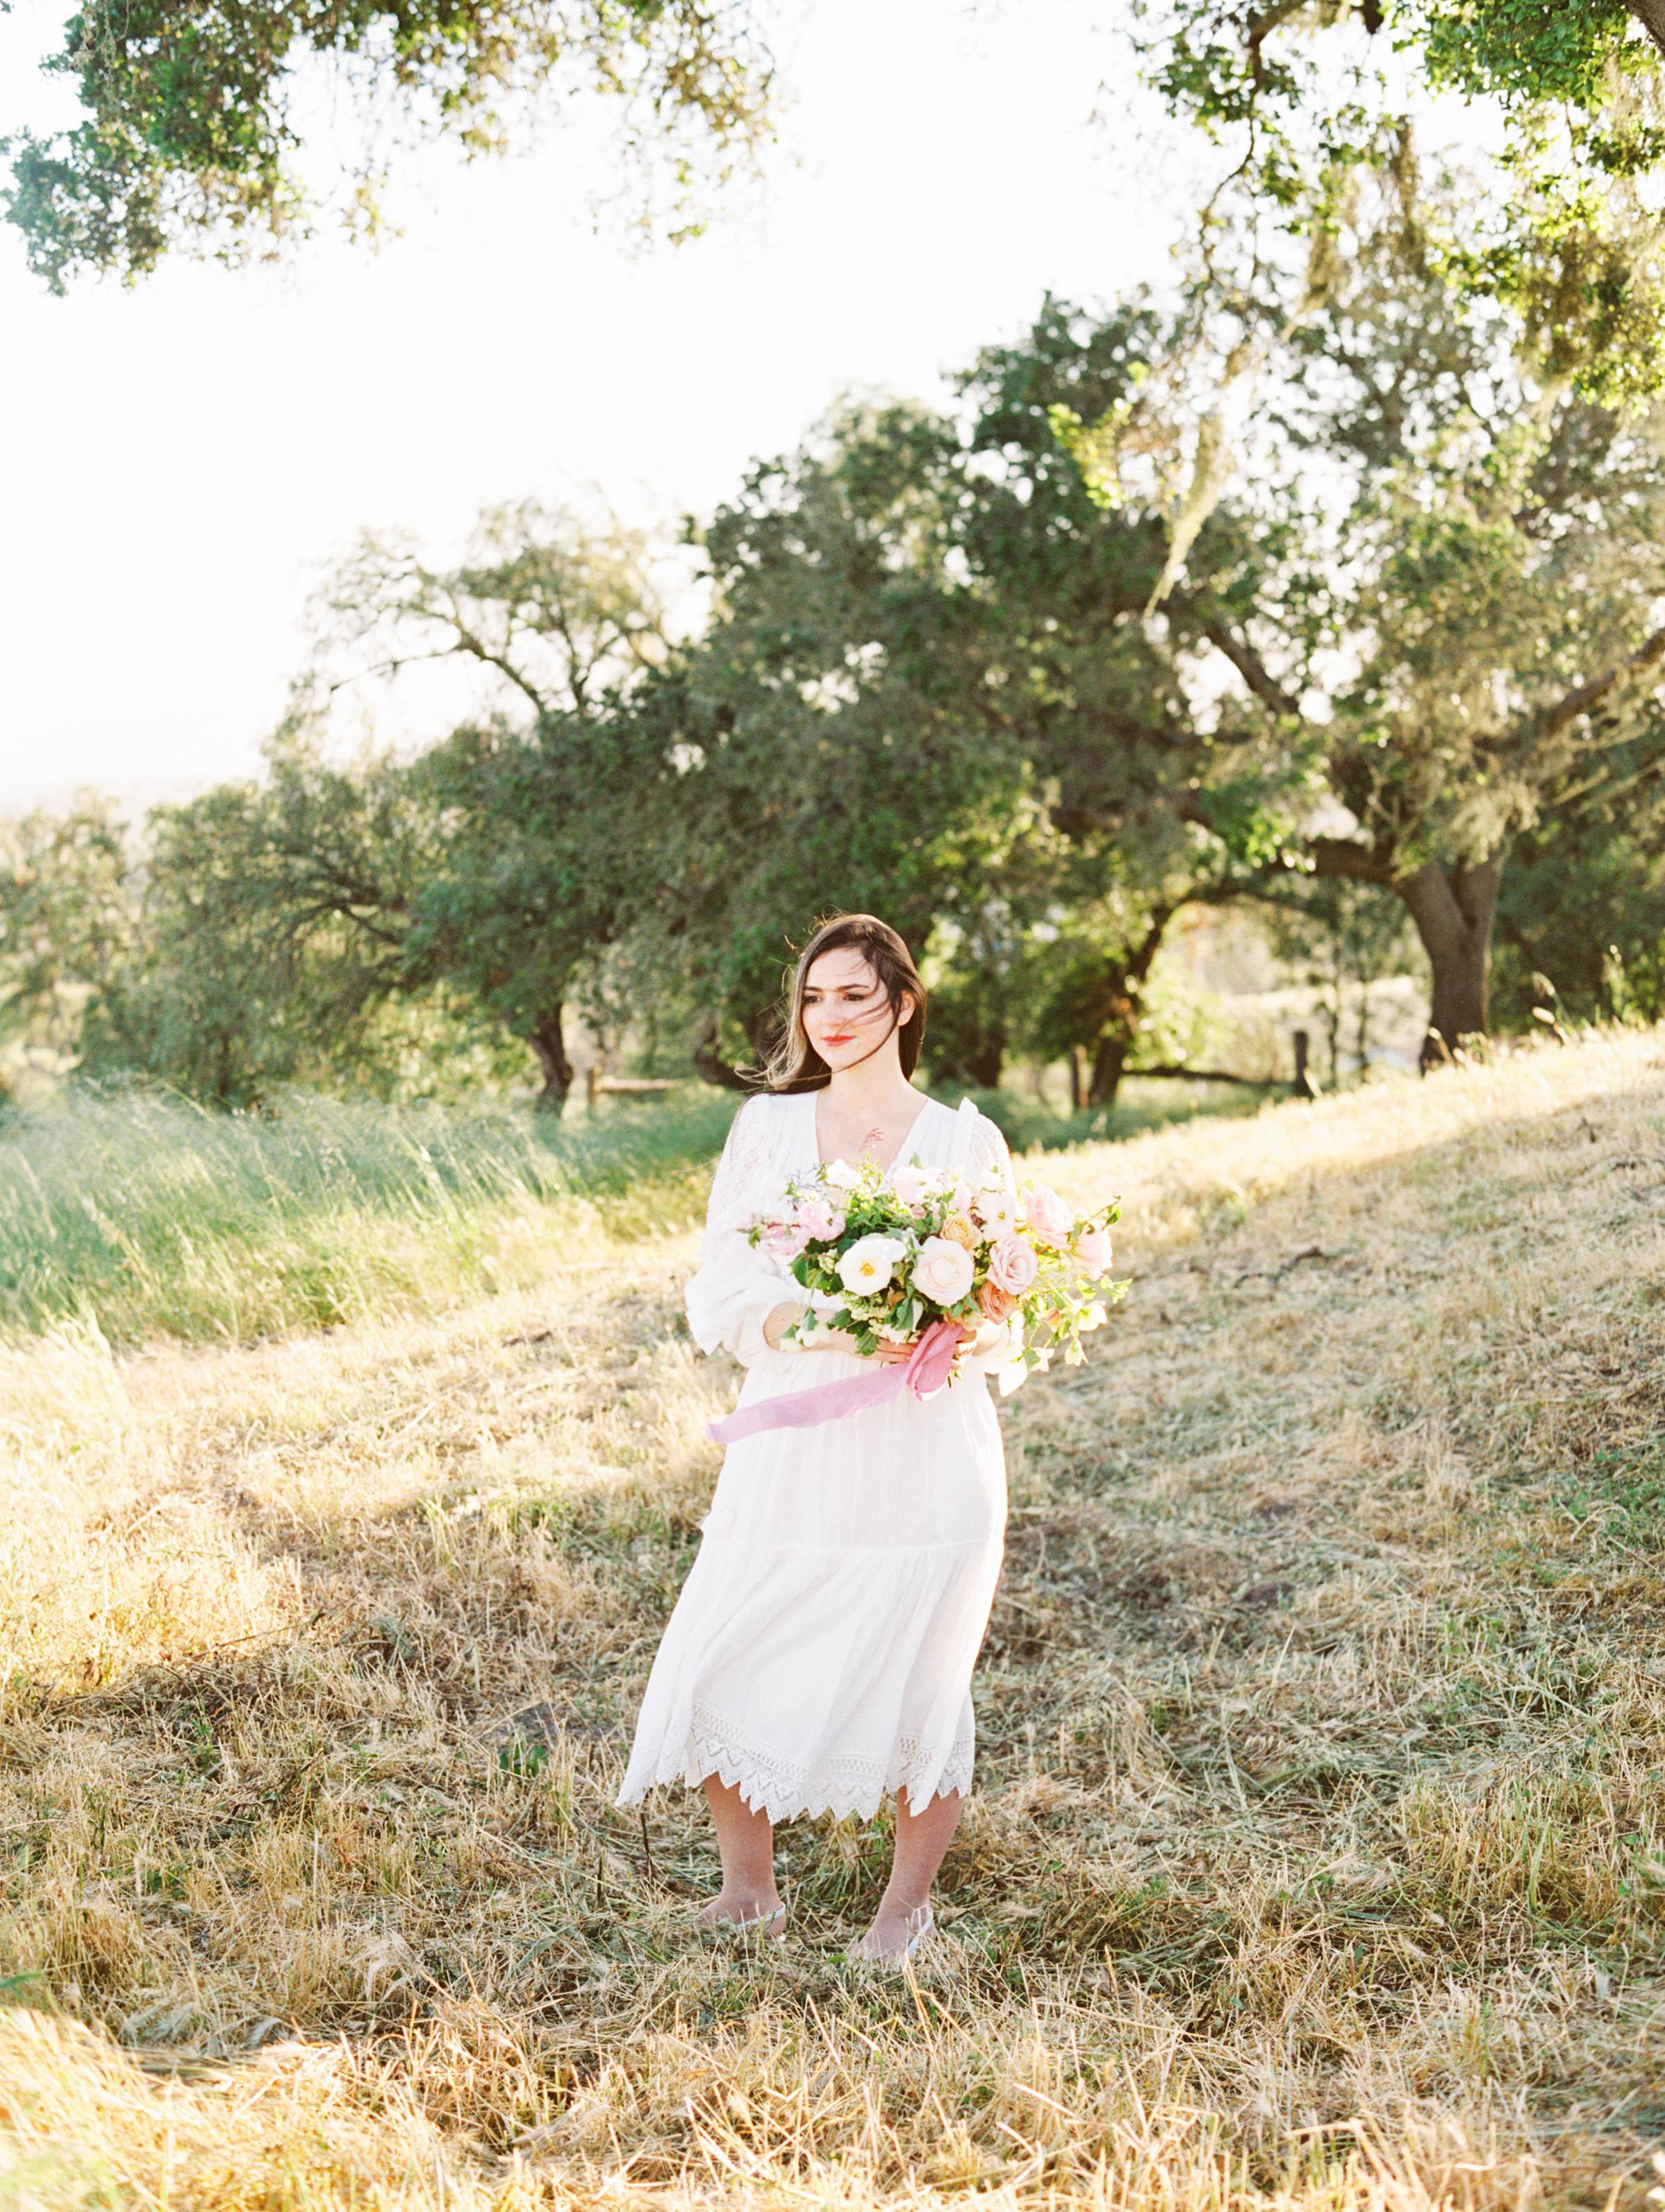 kelsandmichael_wedding_lieffranch-299.jpg